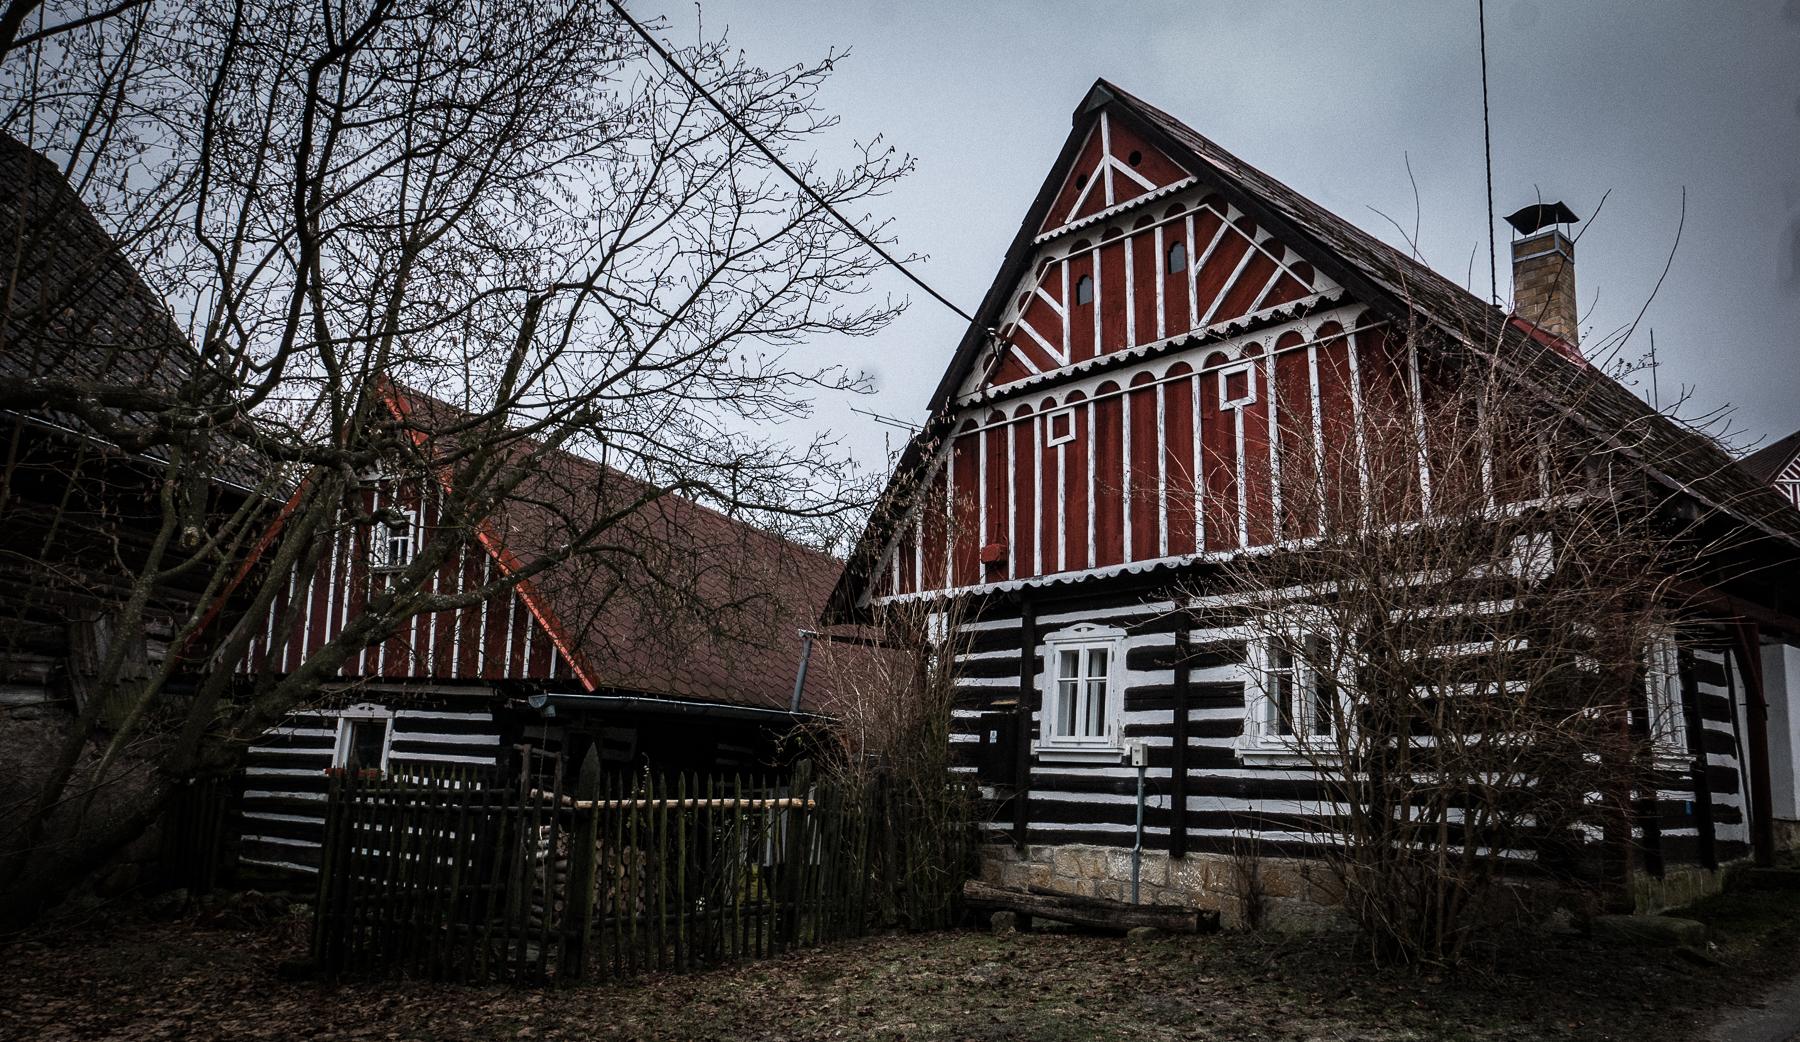 Winter photo workshop in Bohemia. Mala skala wooden dwelling